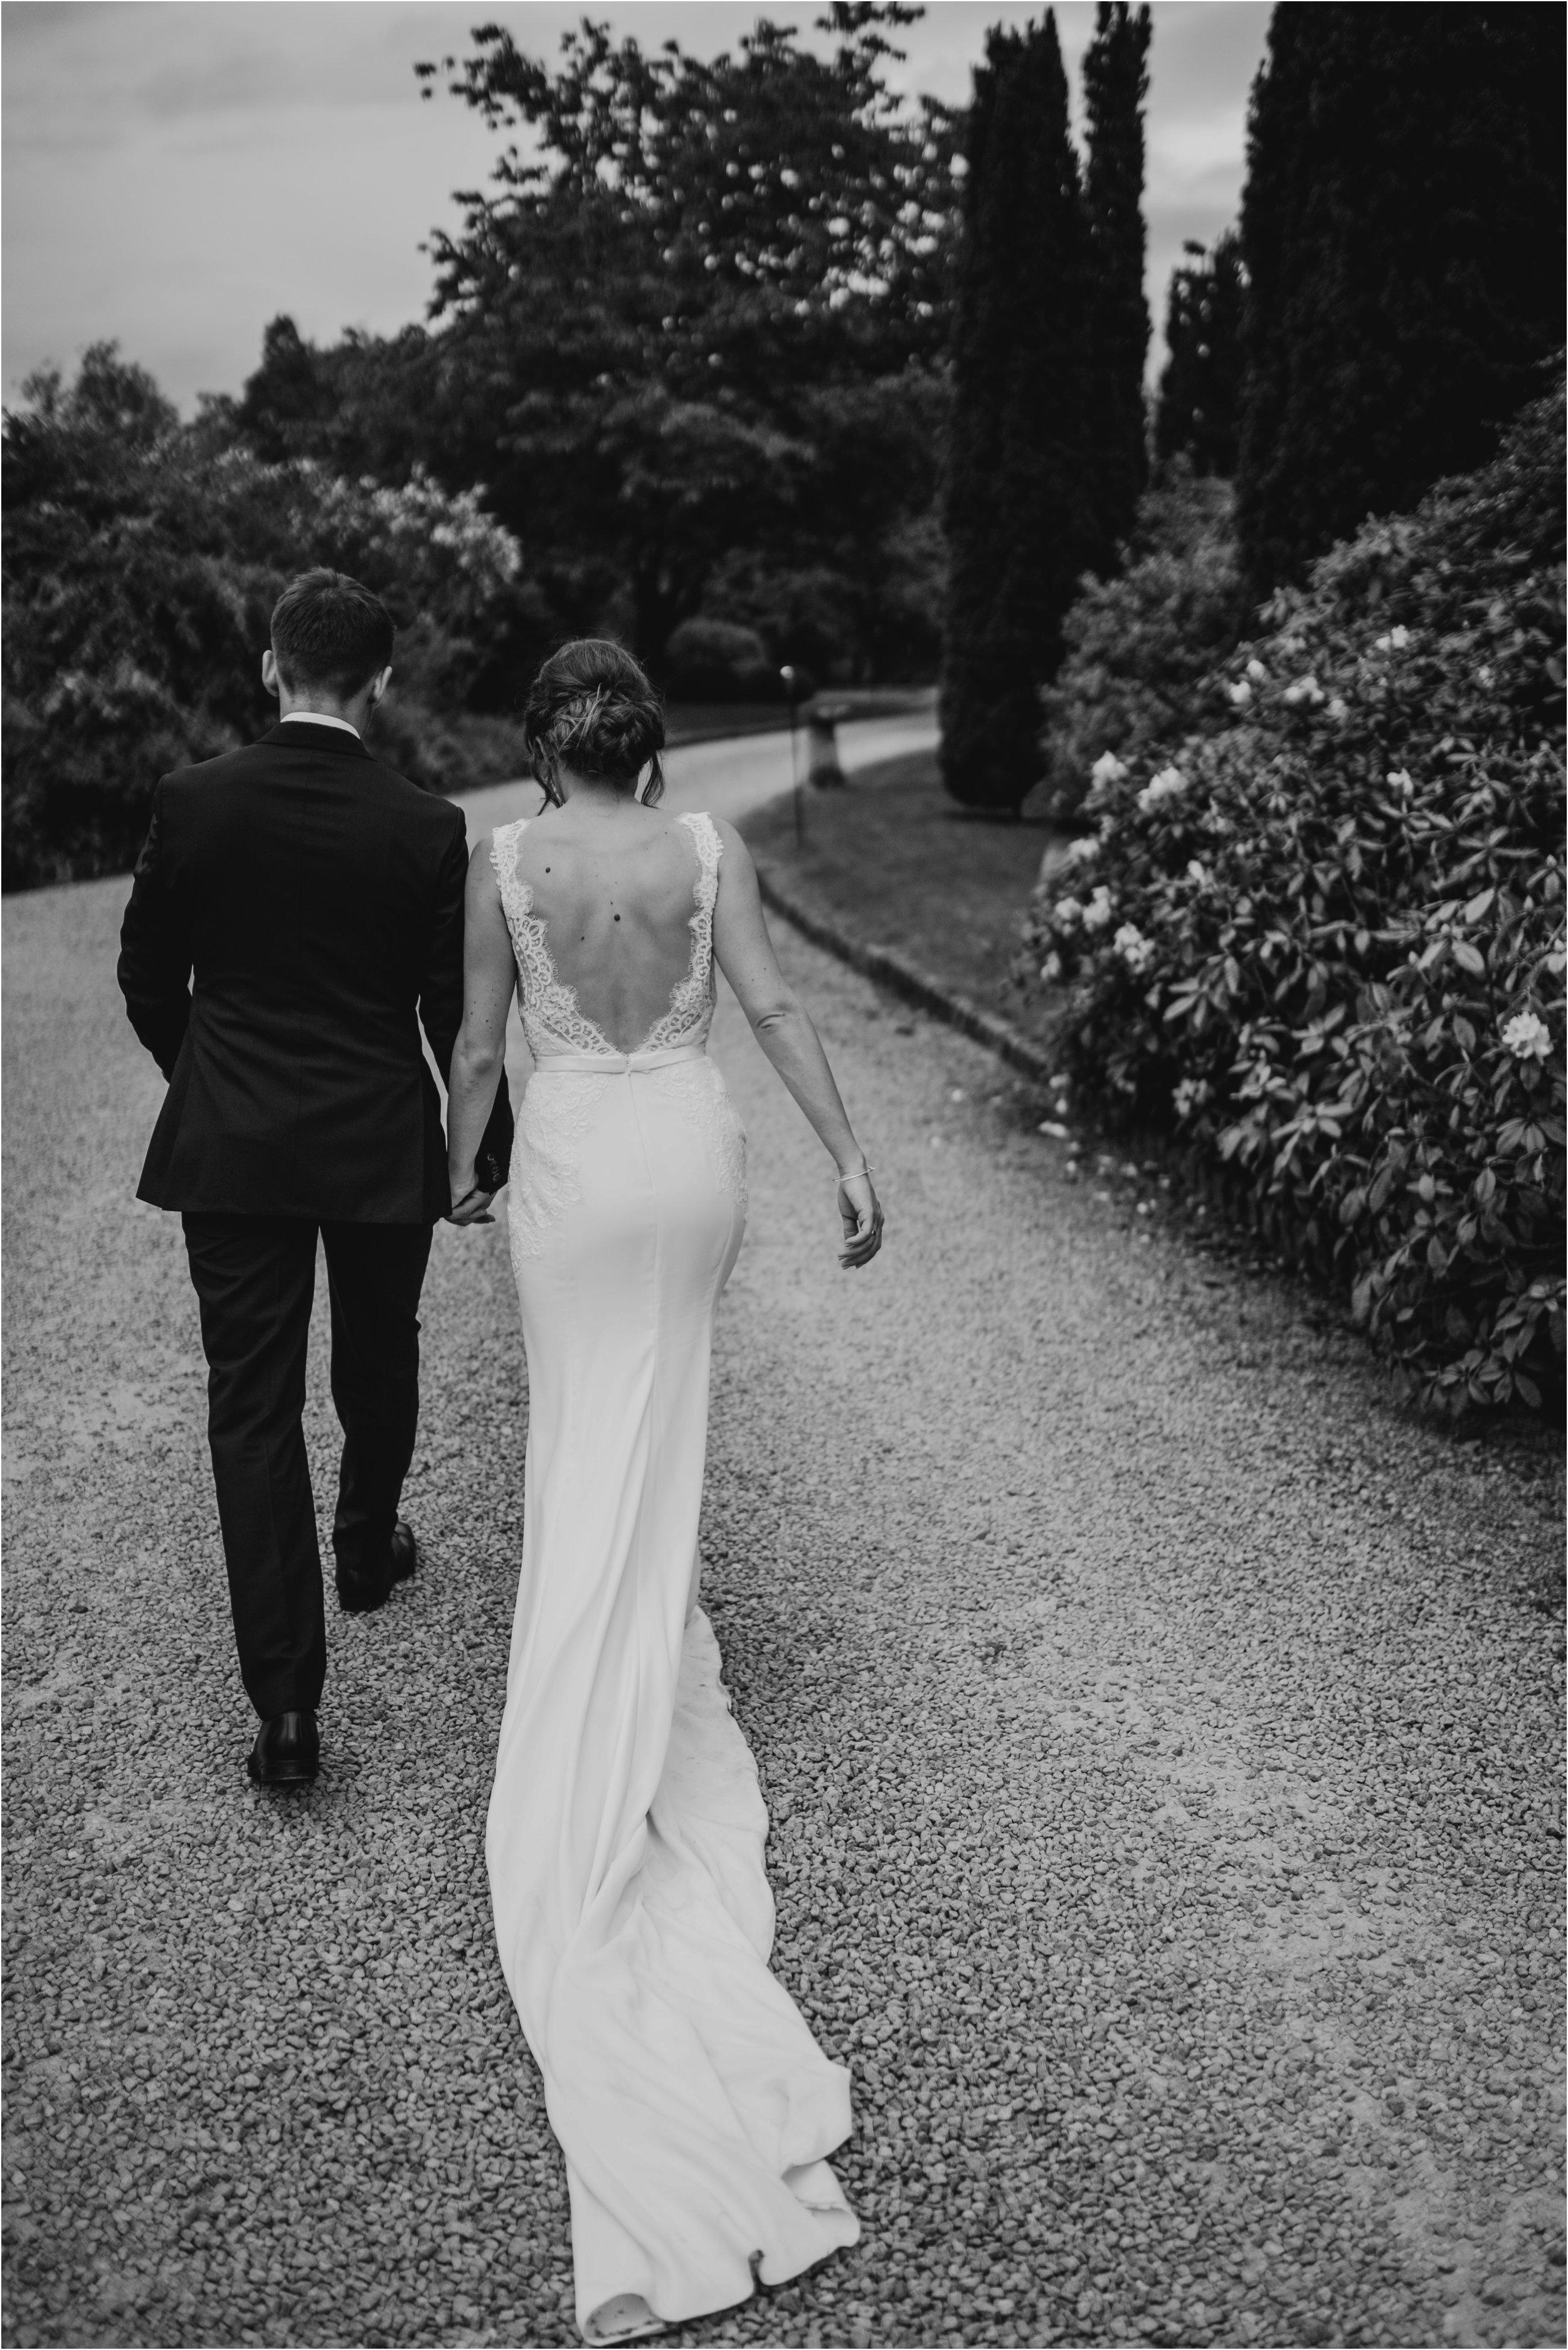 Dewsall Court Herefordshire wedding photographer_0138.jpg